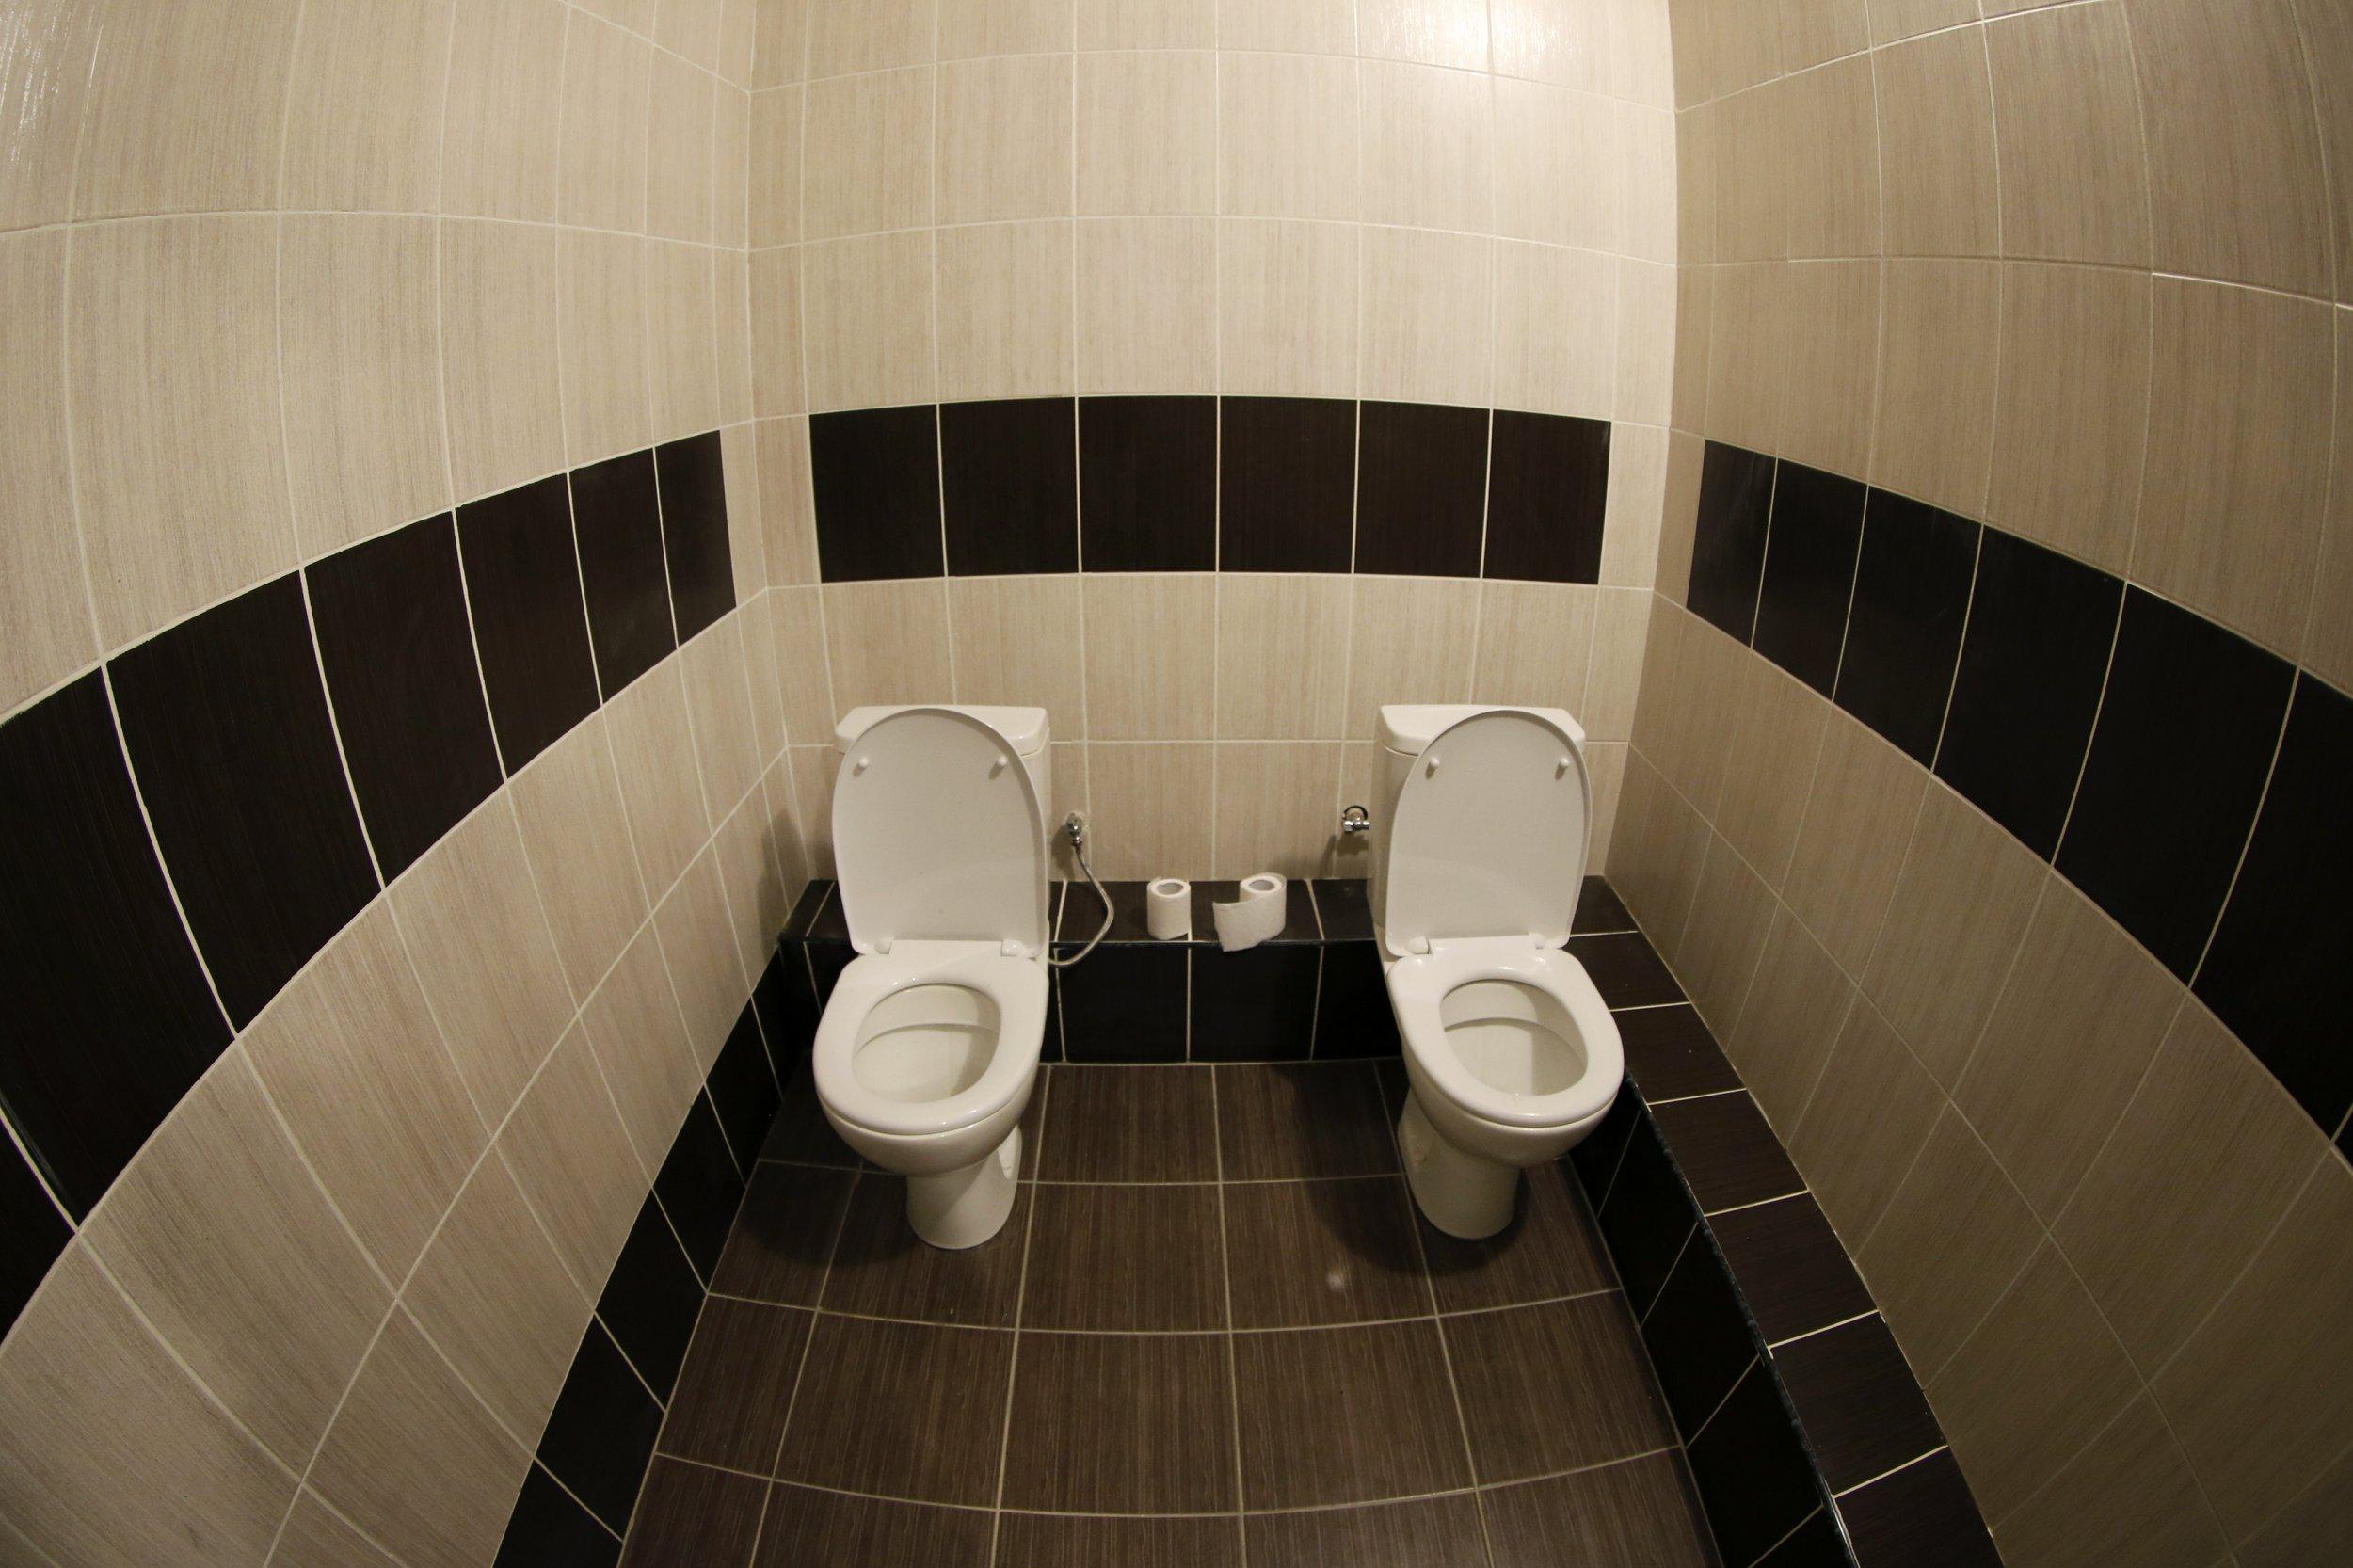 11_03_Toilets_01